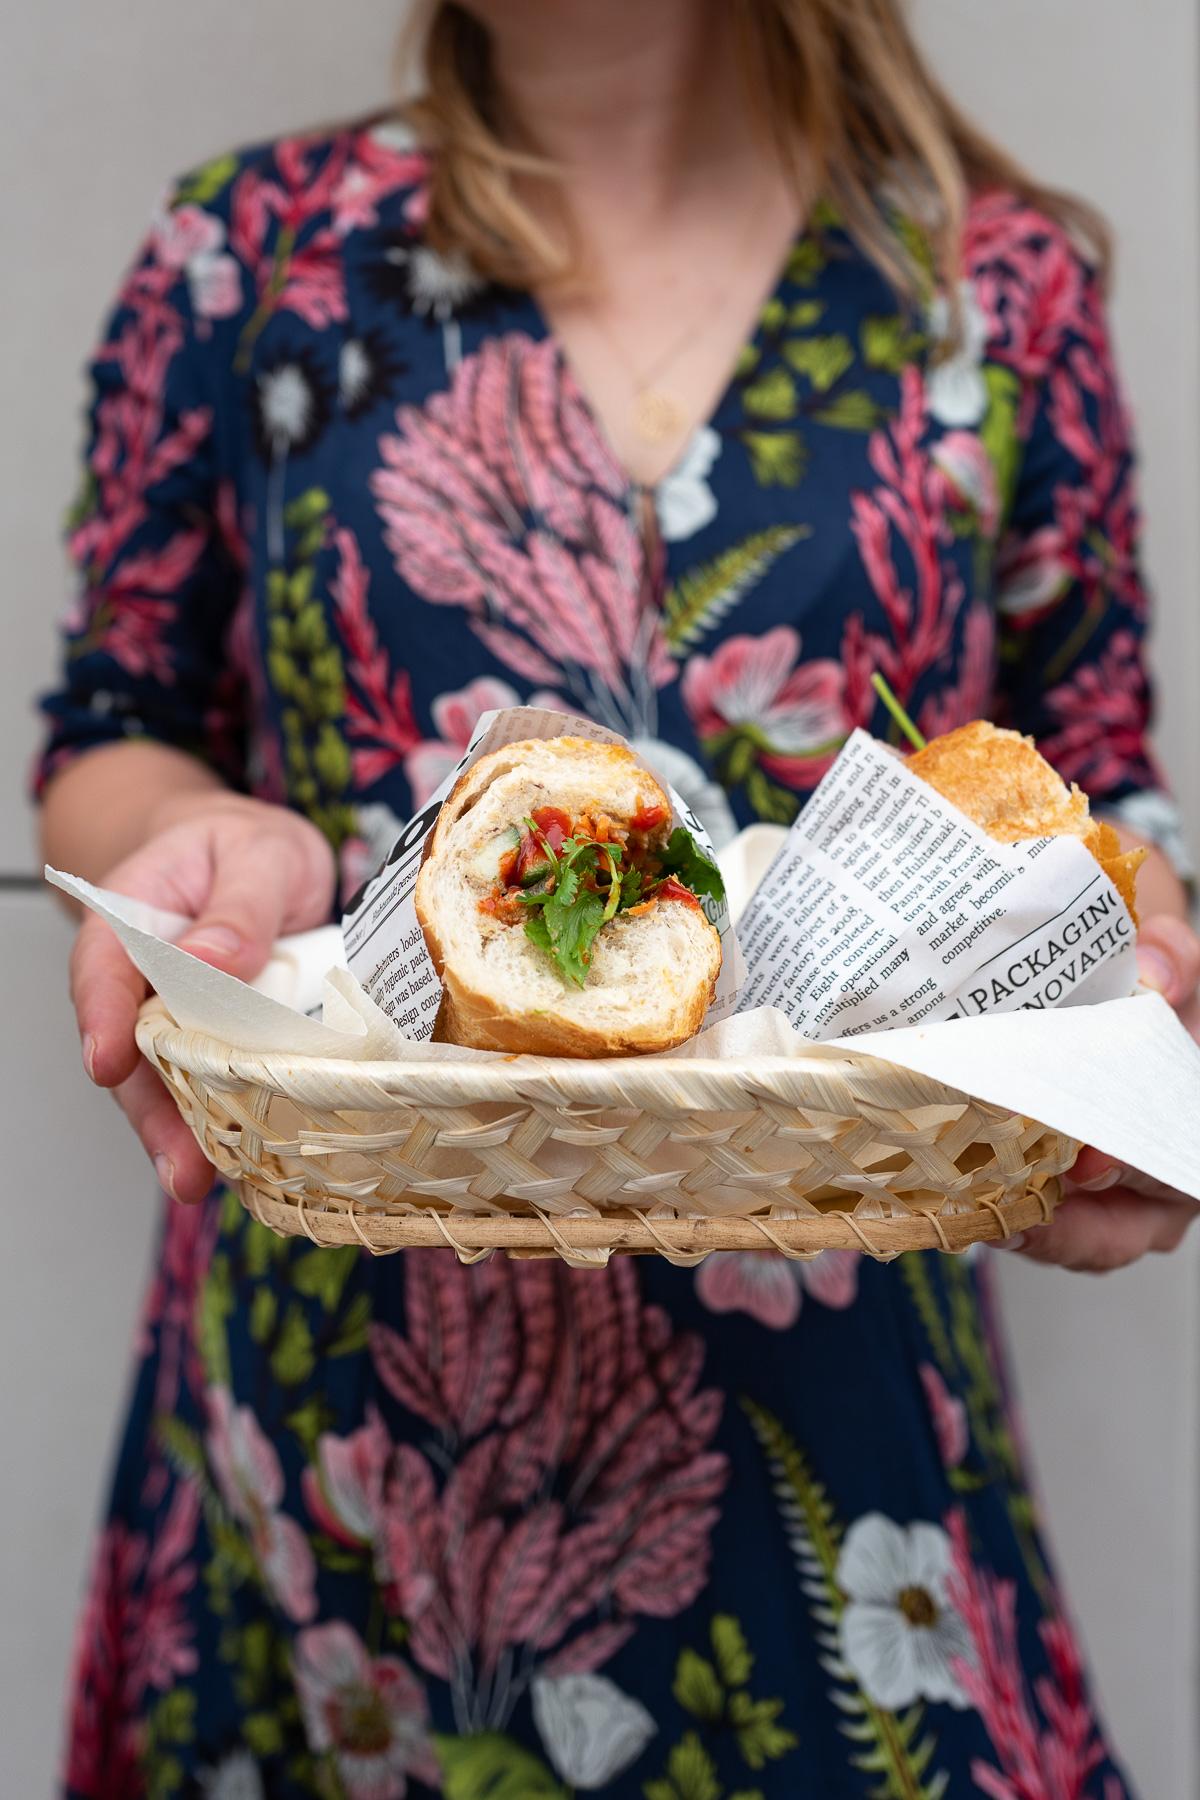 bánh mì pâté vegan (sezonowo)